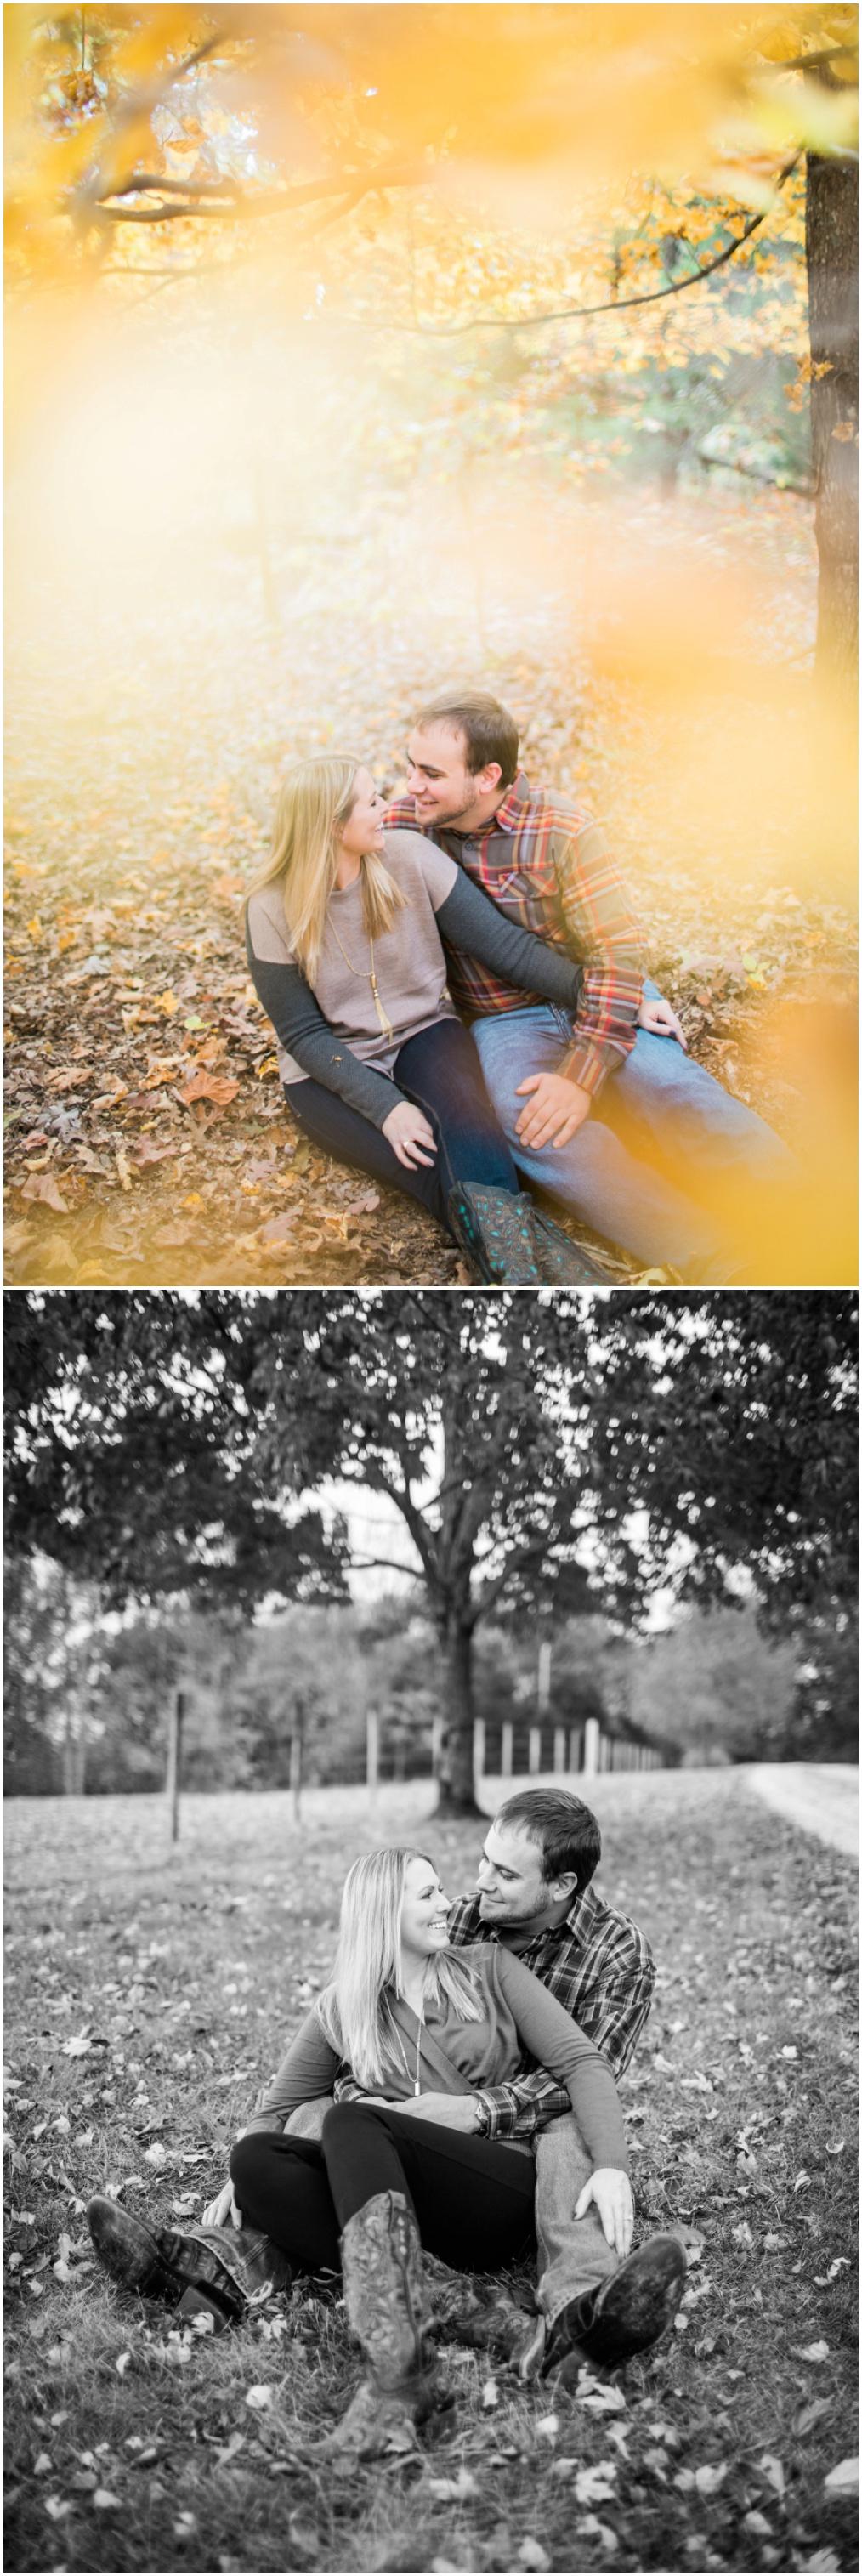 wedding-engagement-photography-missouri8.jpg